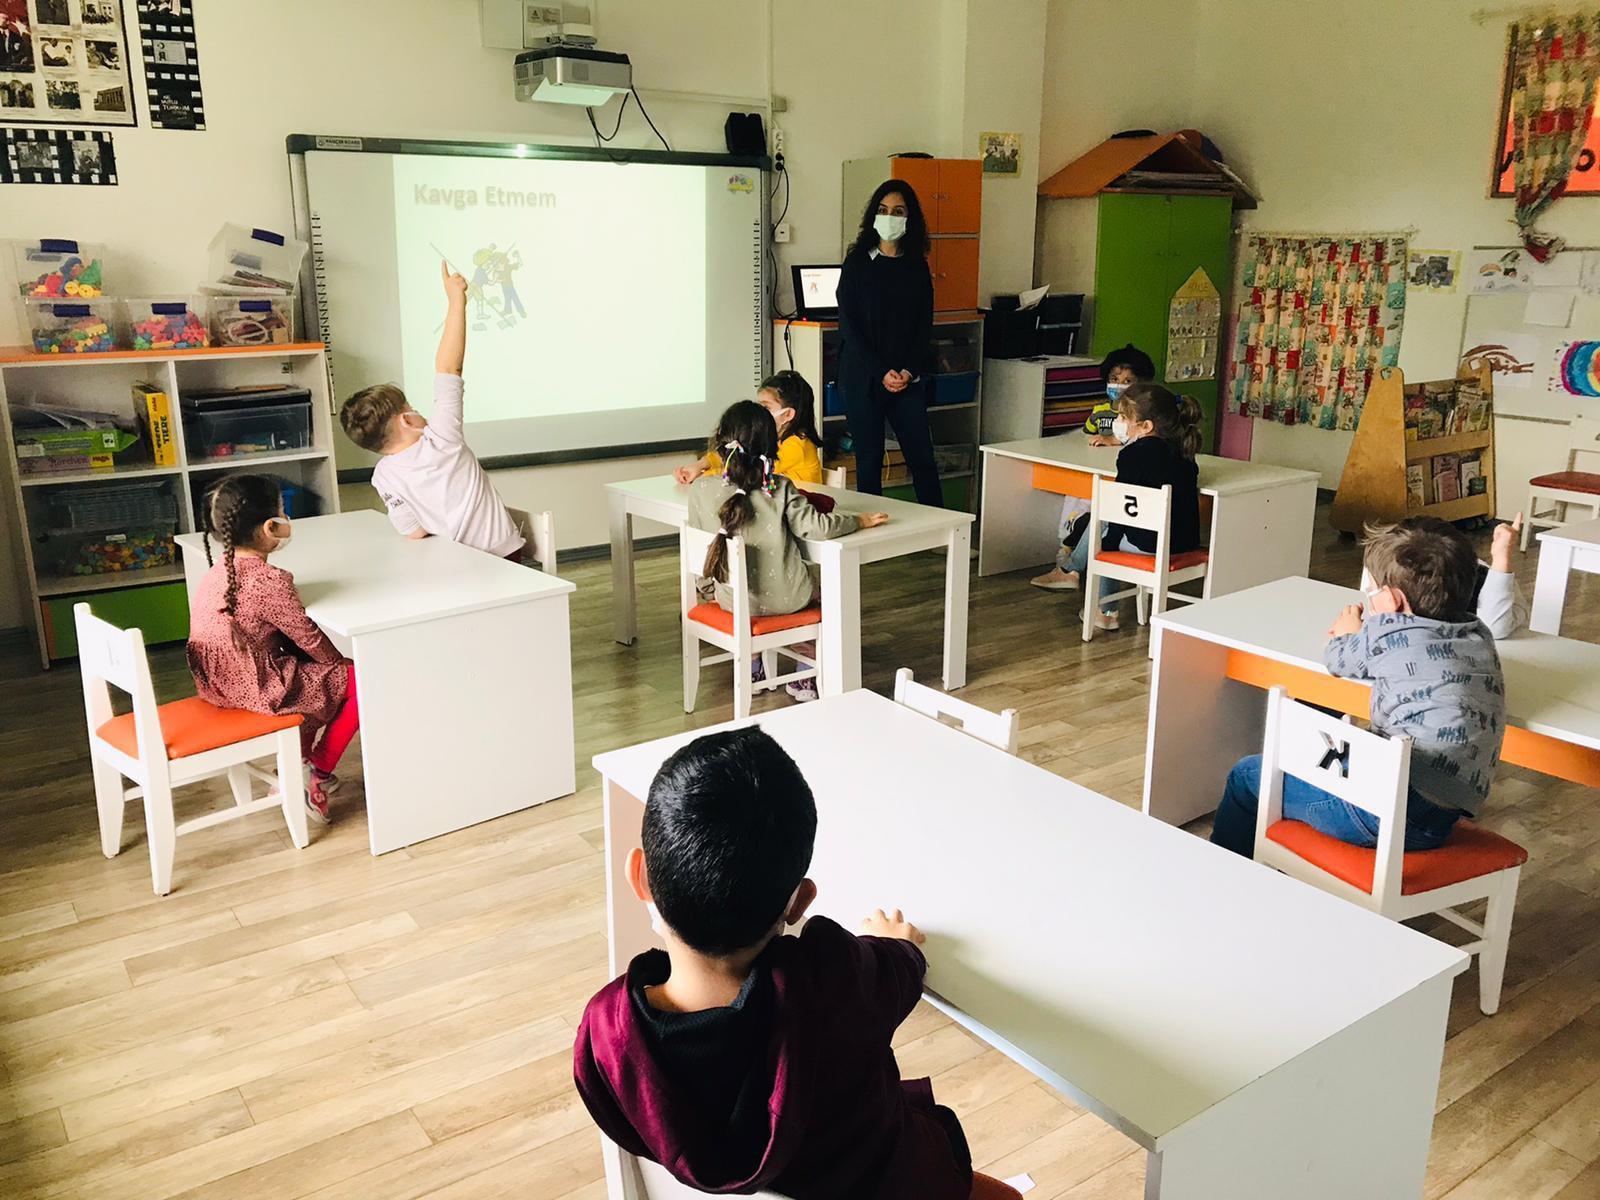 Pozitif Davranışlar Eğitimi